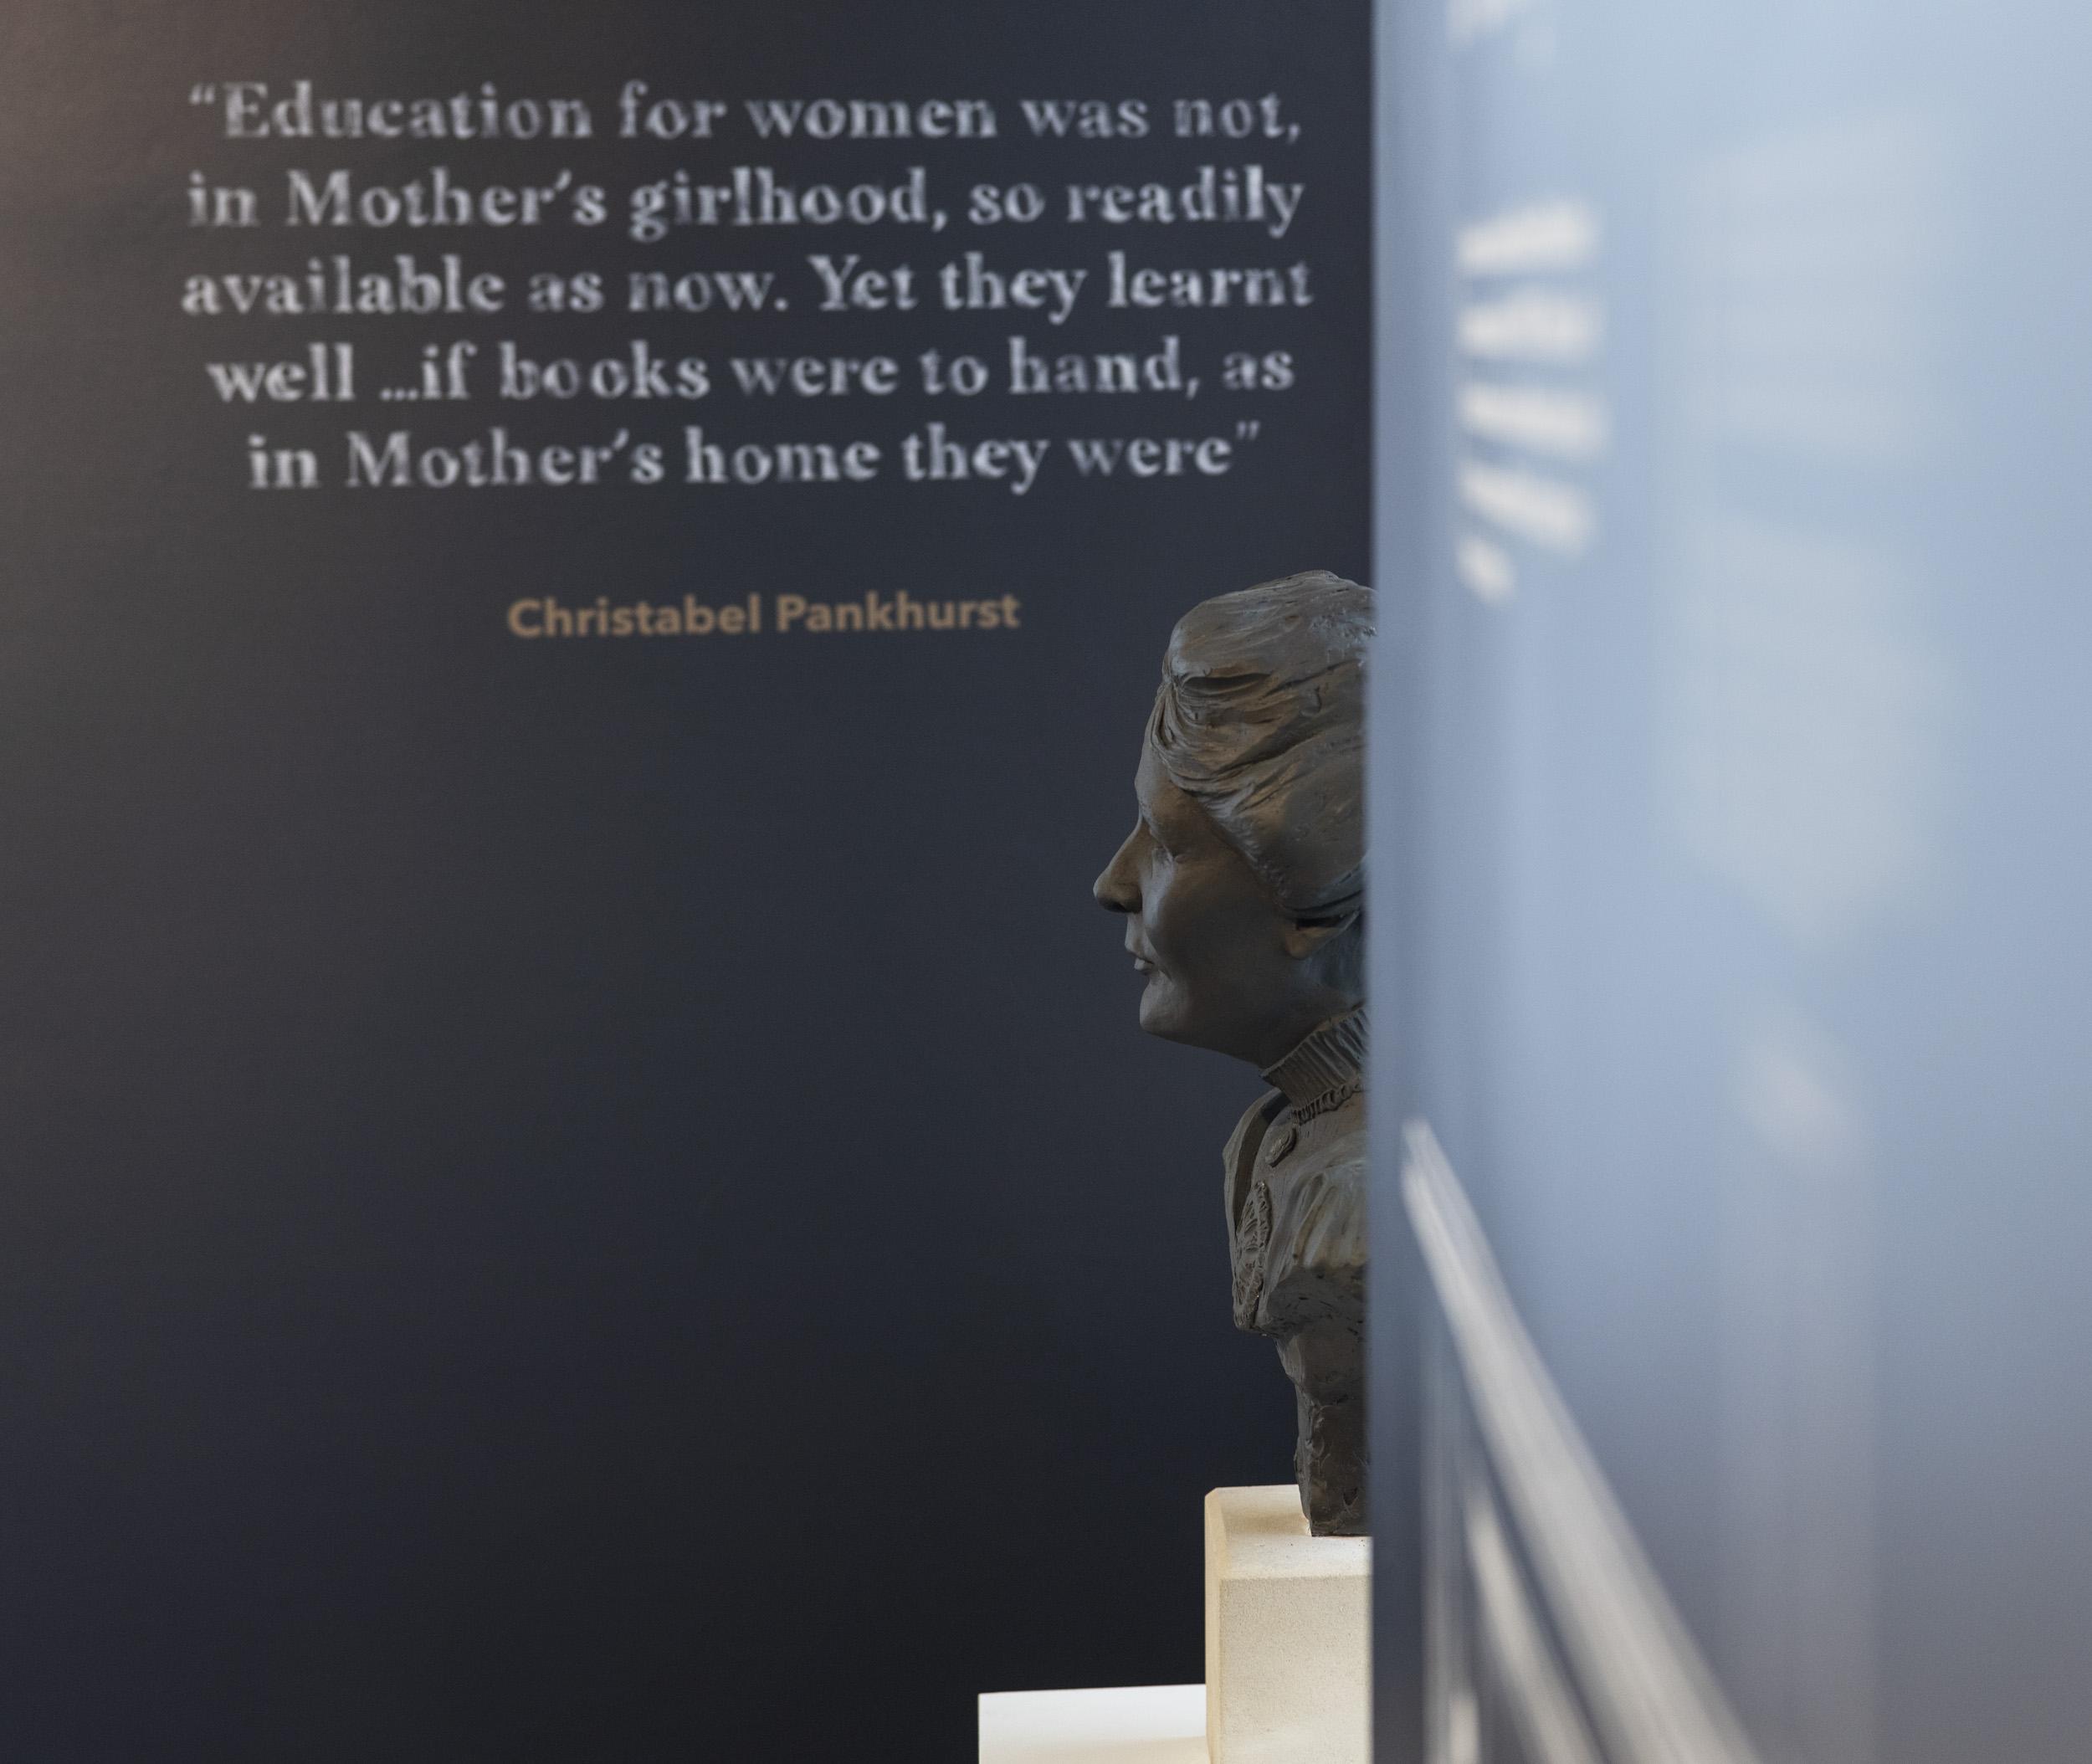 Christabel Pankhurst quote Pankhurst Centre